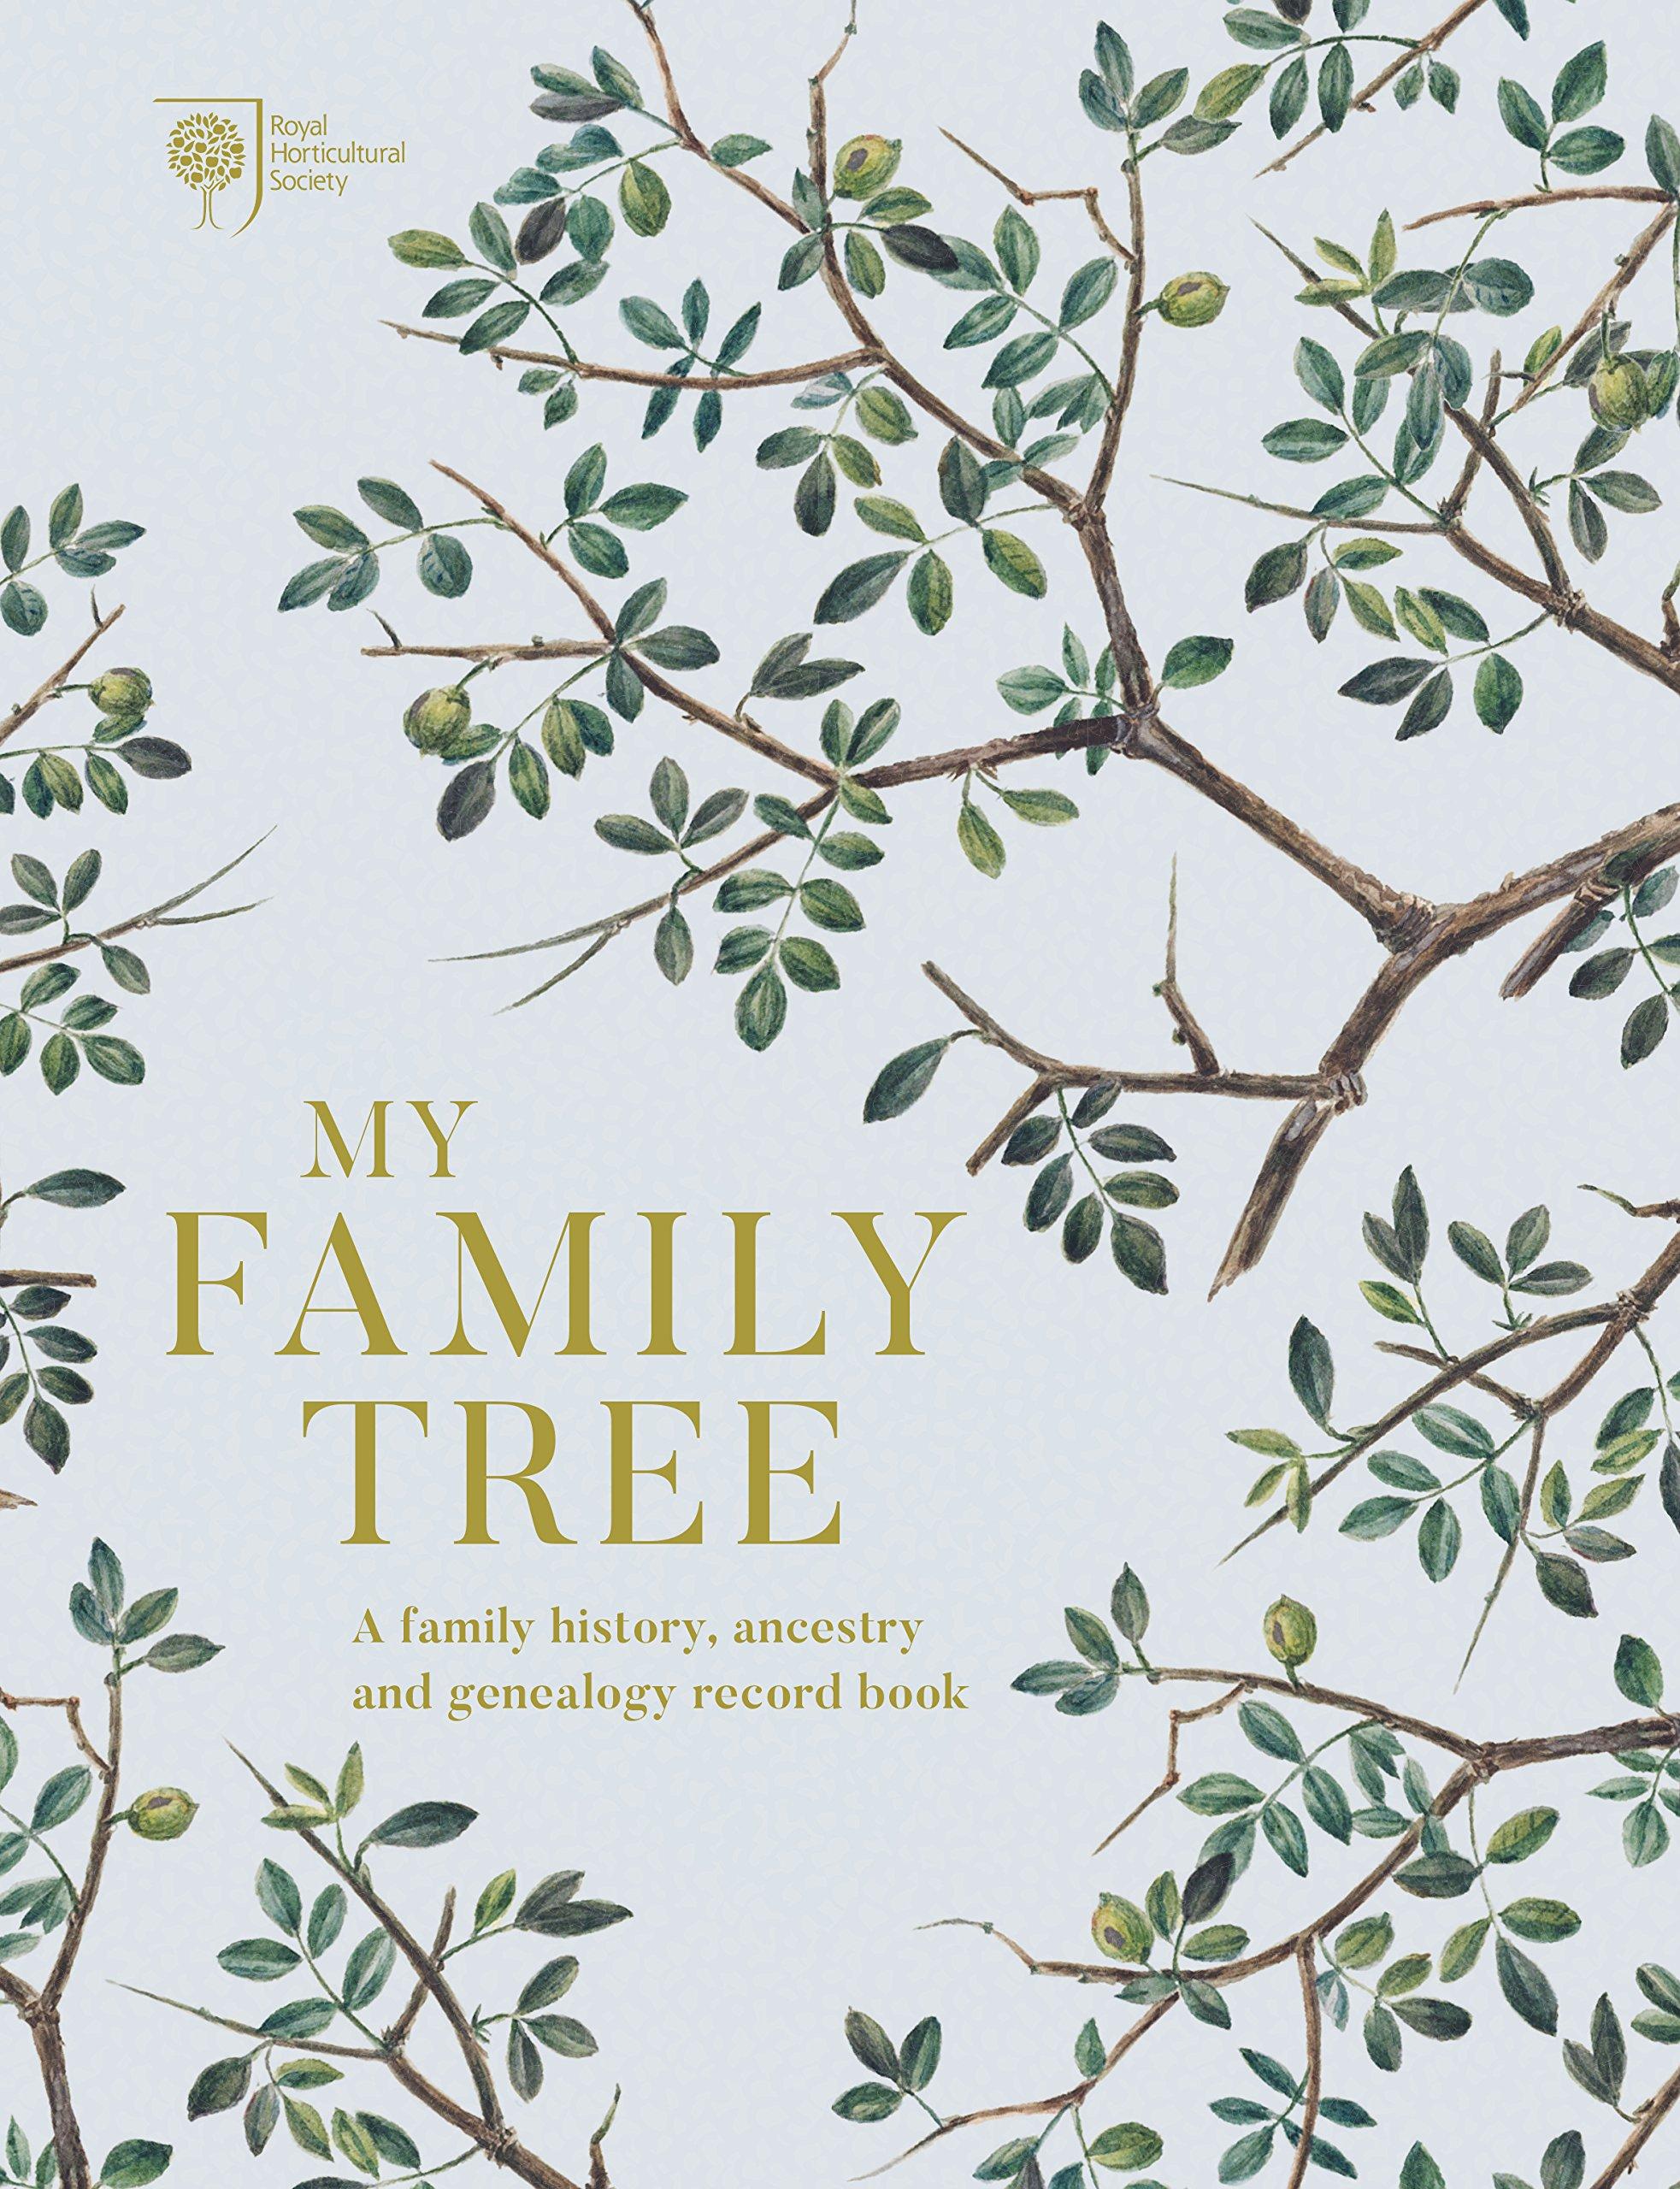 amazon my family tree royal horticultural society royal